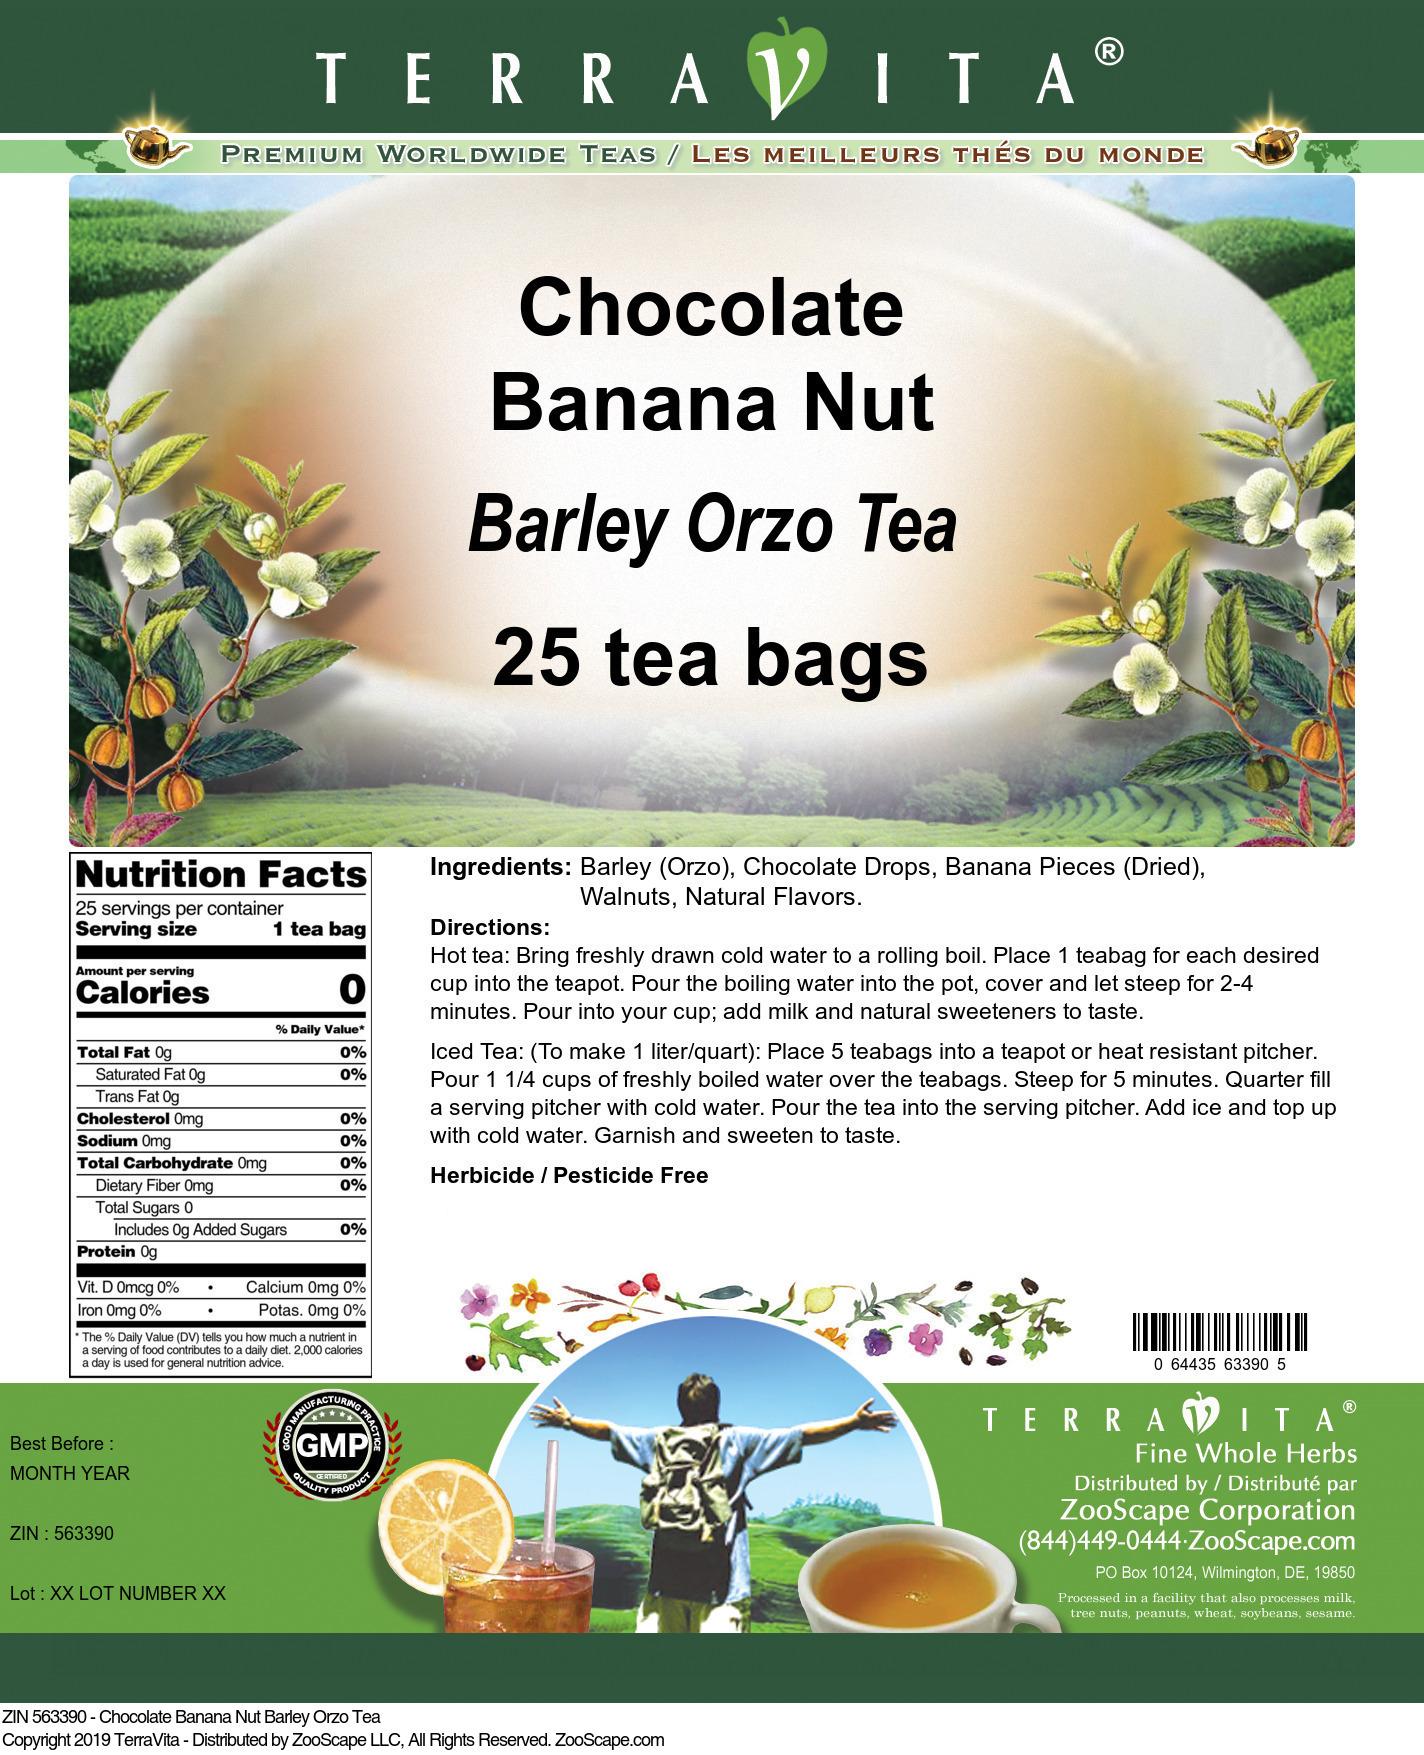 Chocolate Banana Nut Barley Orzo Tea